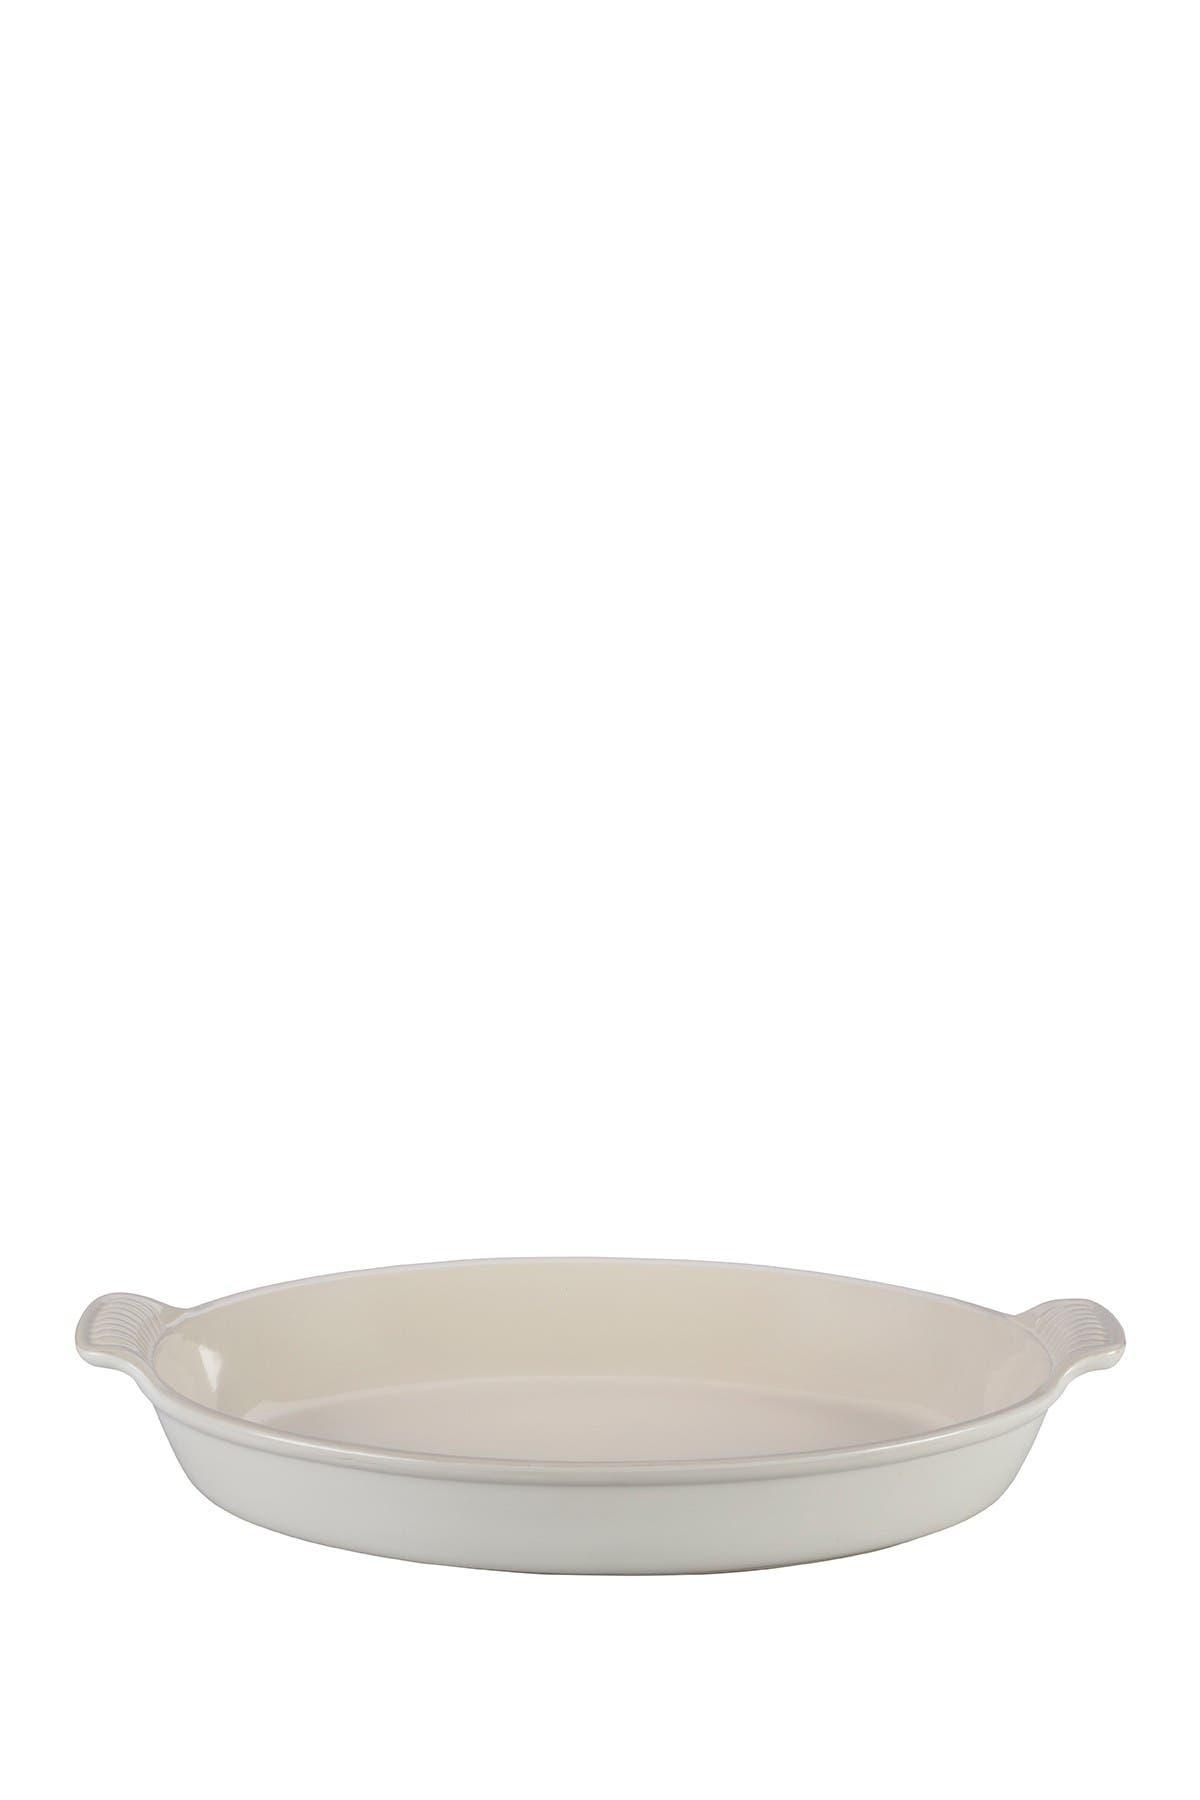 Image of Le Creuset Heritage Oval Au Gratin Dish - 3.1 qt.